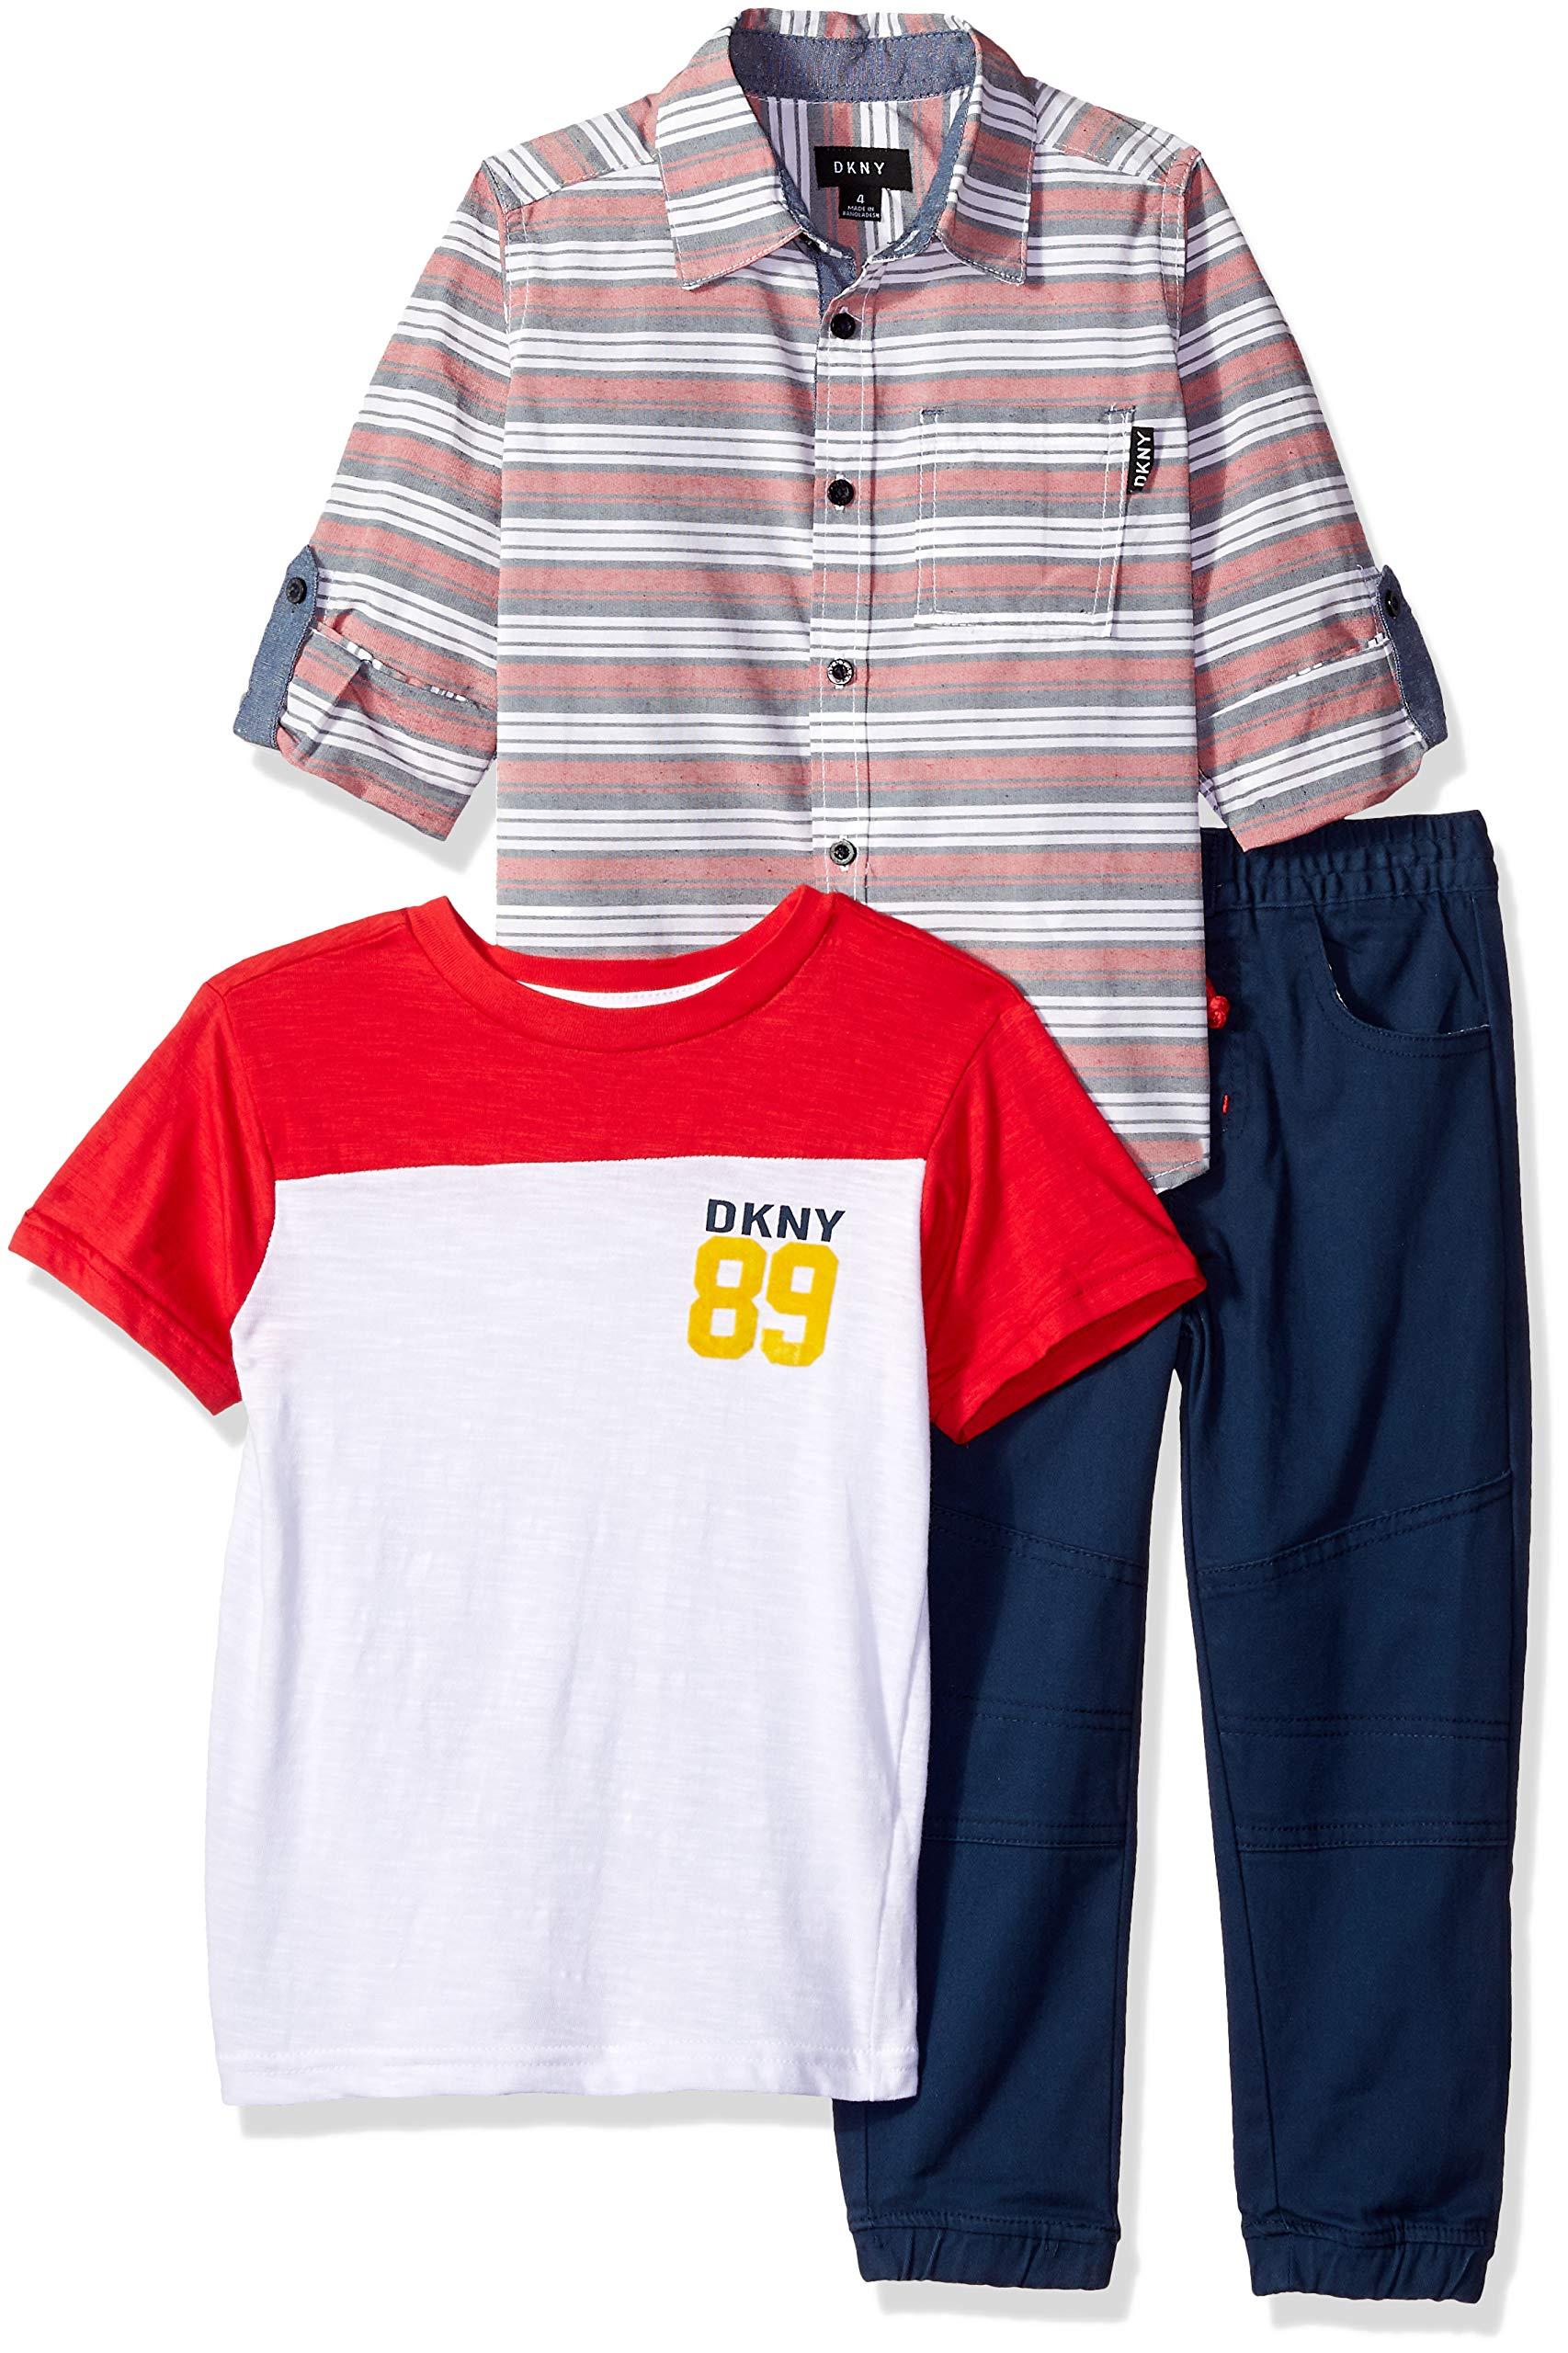 DKNY Boys' Little Manhattan Sport, T-Shirt and Jog Pant